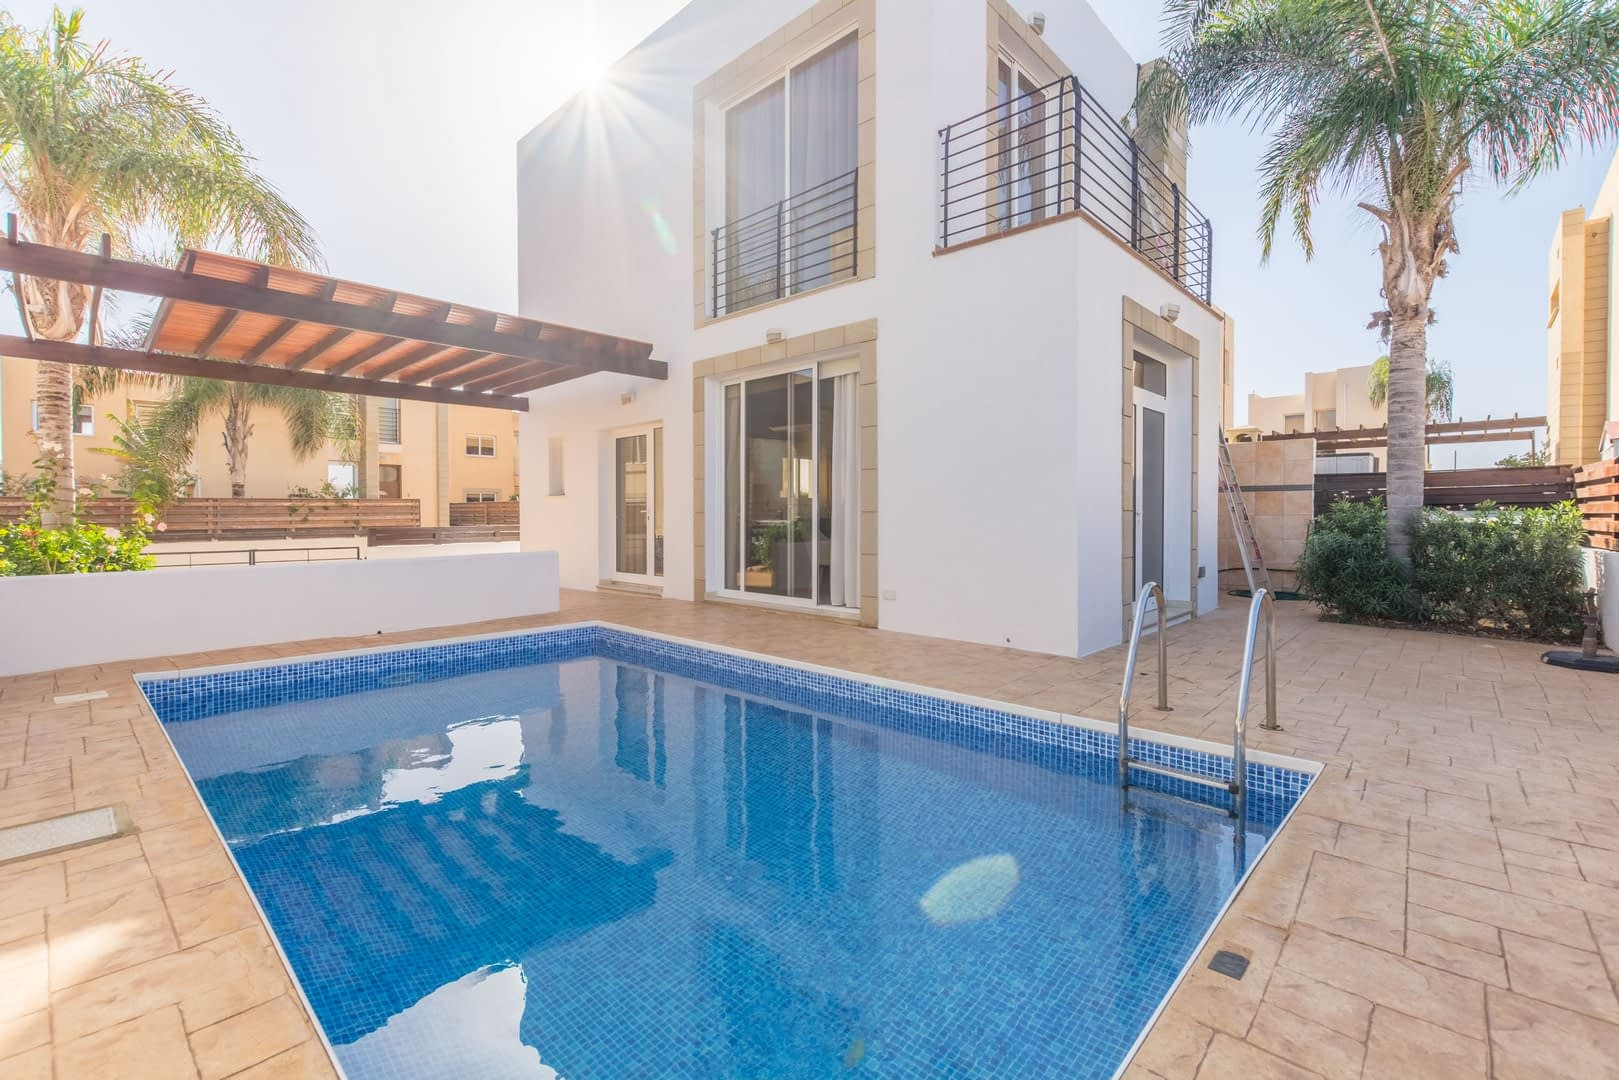 Two Bedroom Villa in Ayia Triada Area